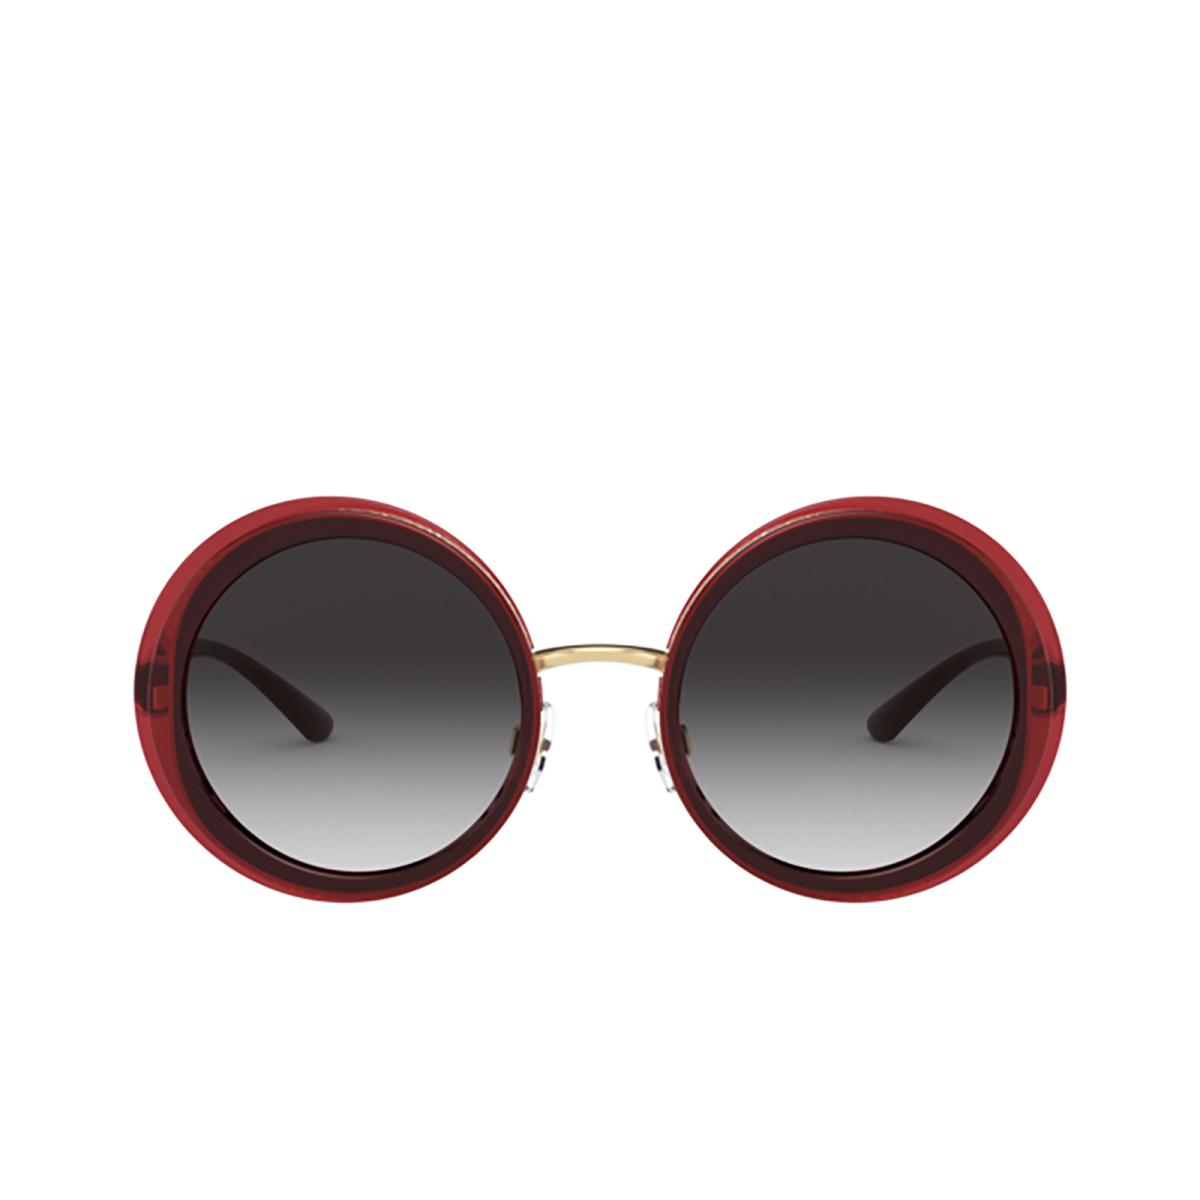 Dolce & Gabbana® Round Sunglasses: DG6127 color Transparent Red 550/8G - 1/3.